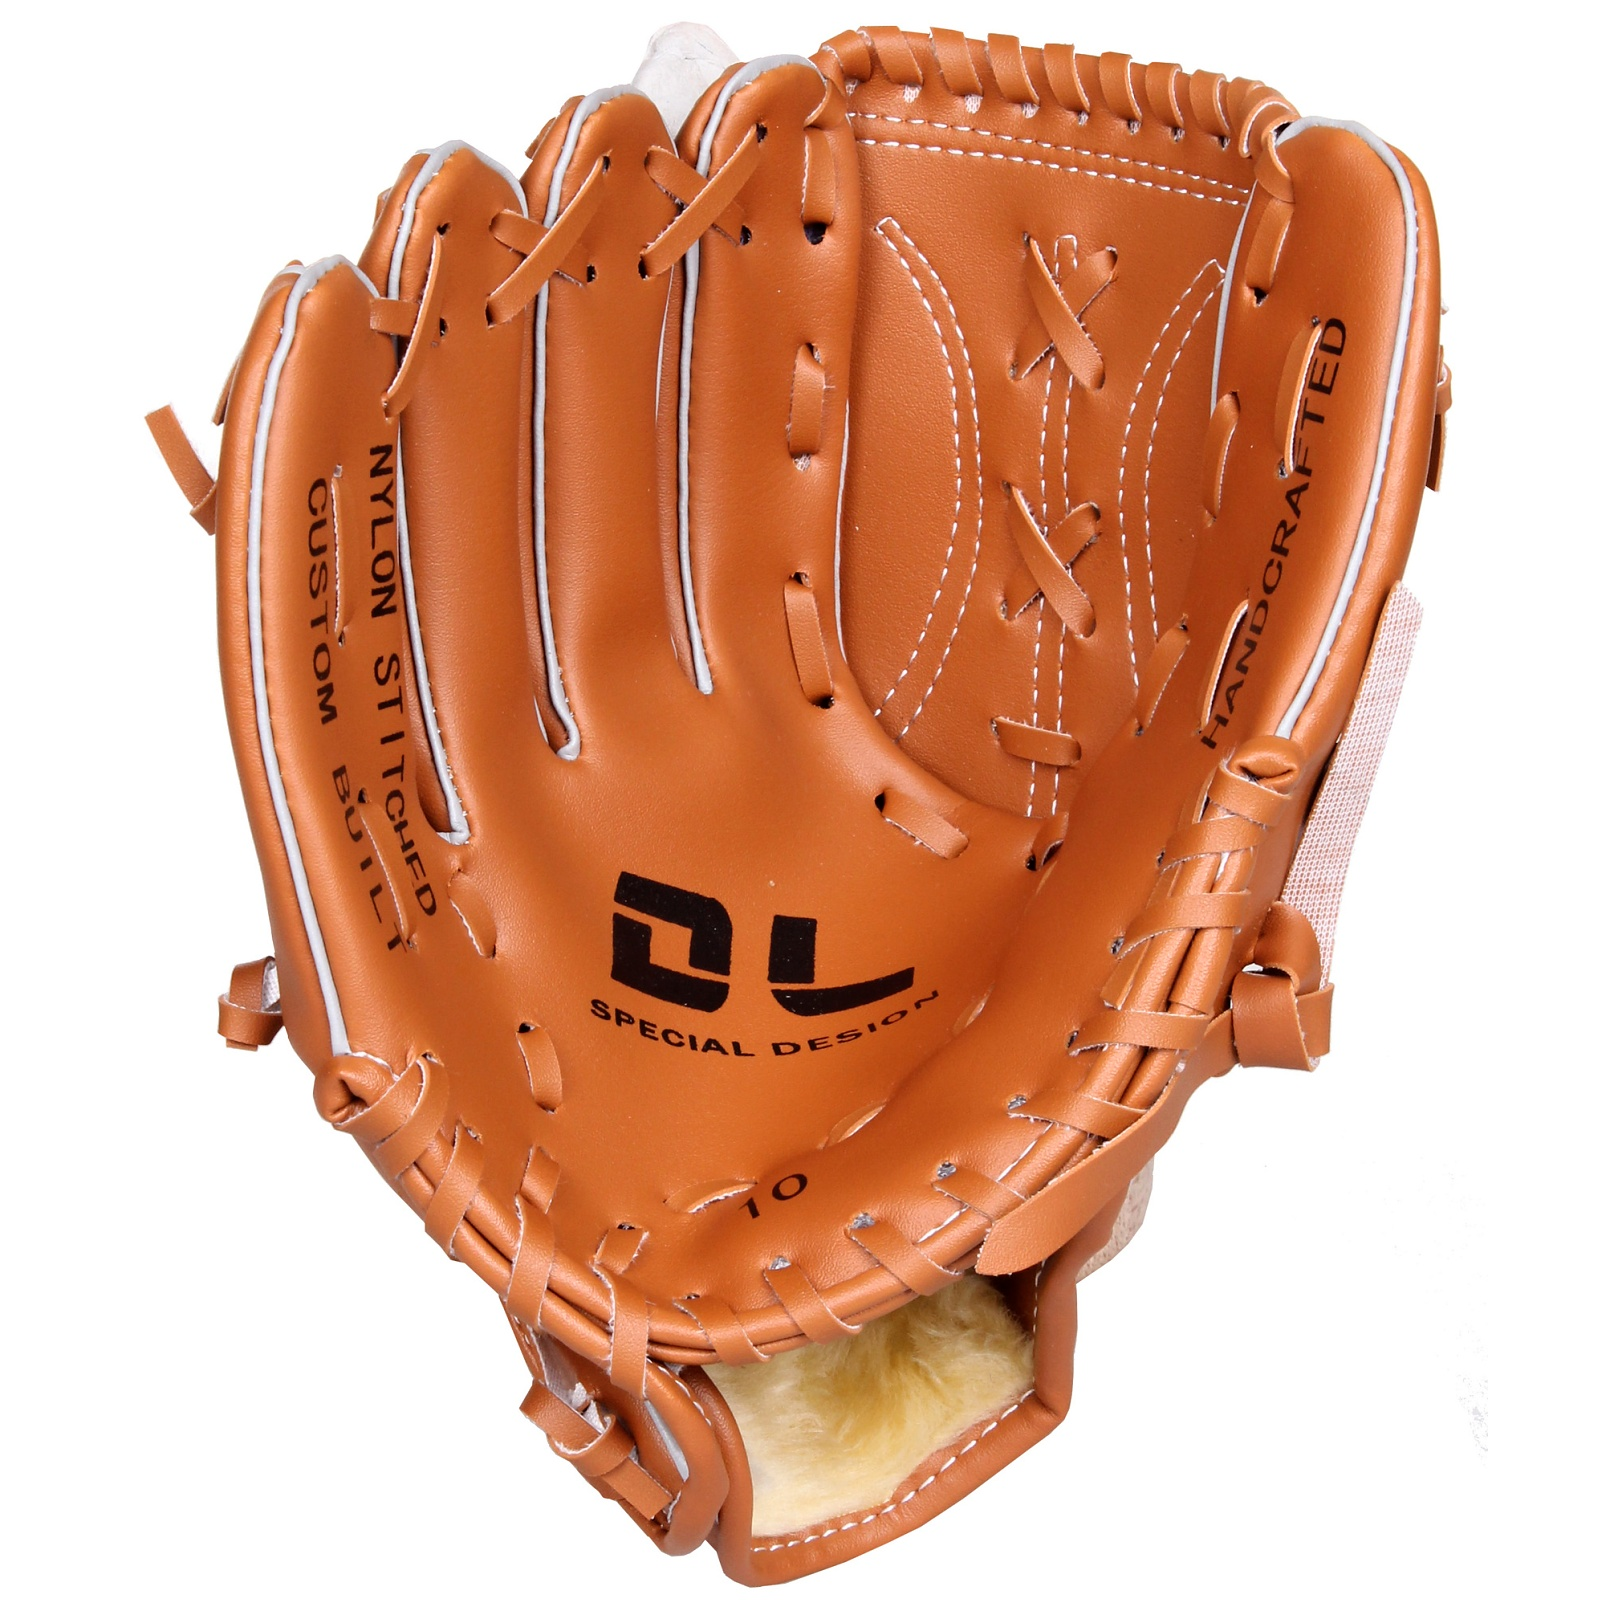 Baseball rukavice MERCO BR-01 13'' pravé